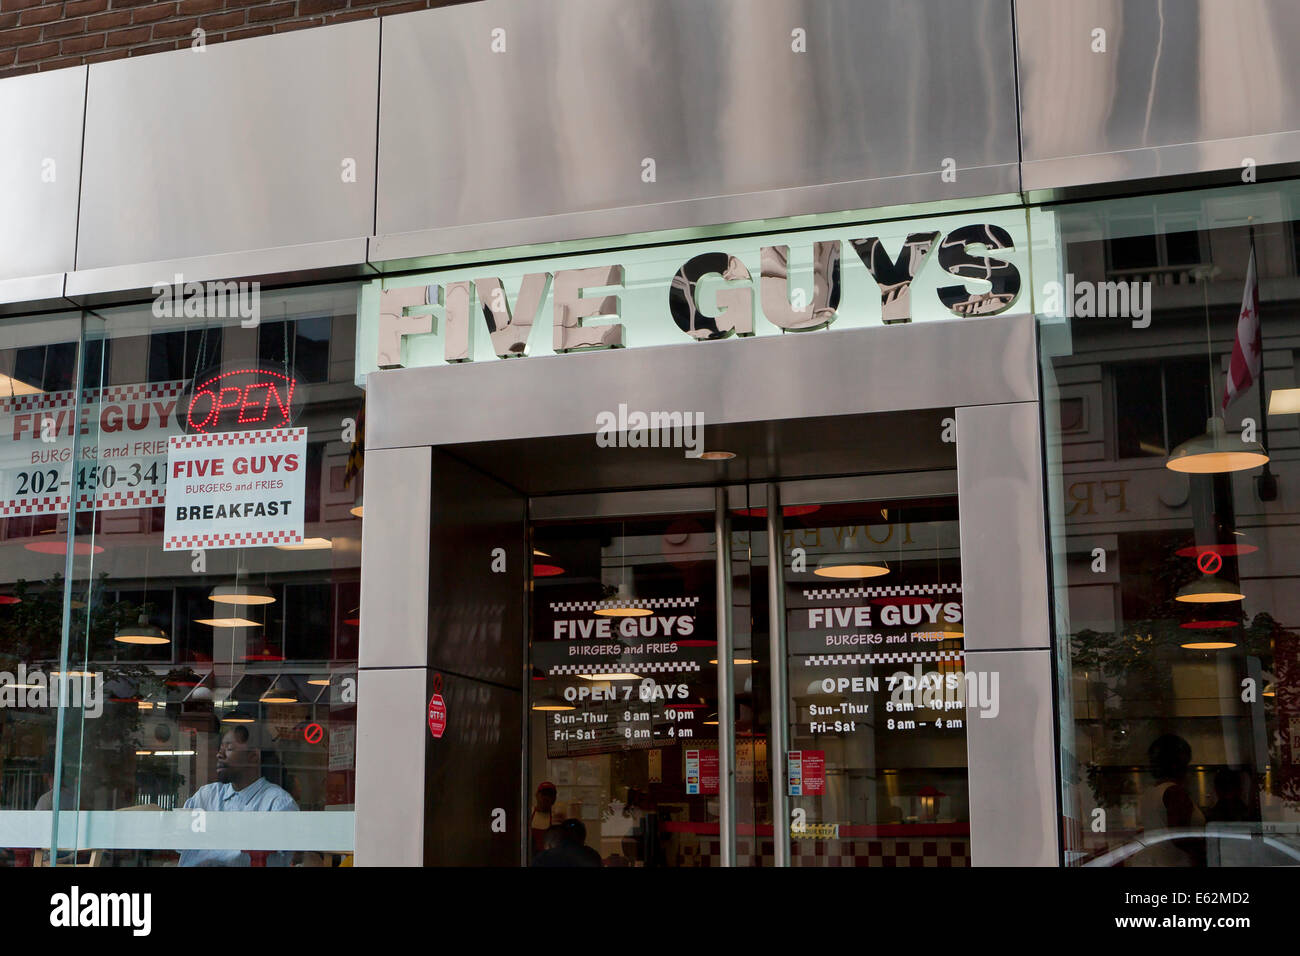 Cinq types de devanture restaurant hamburger - Washington, DC USA Photo Stock